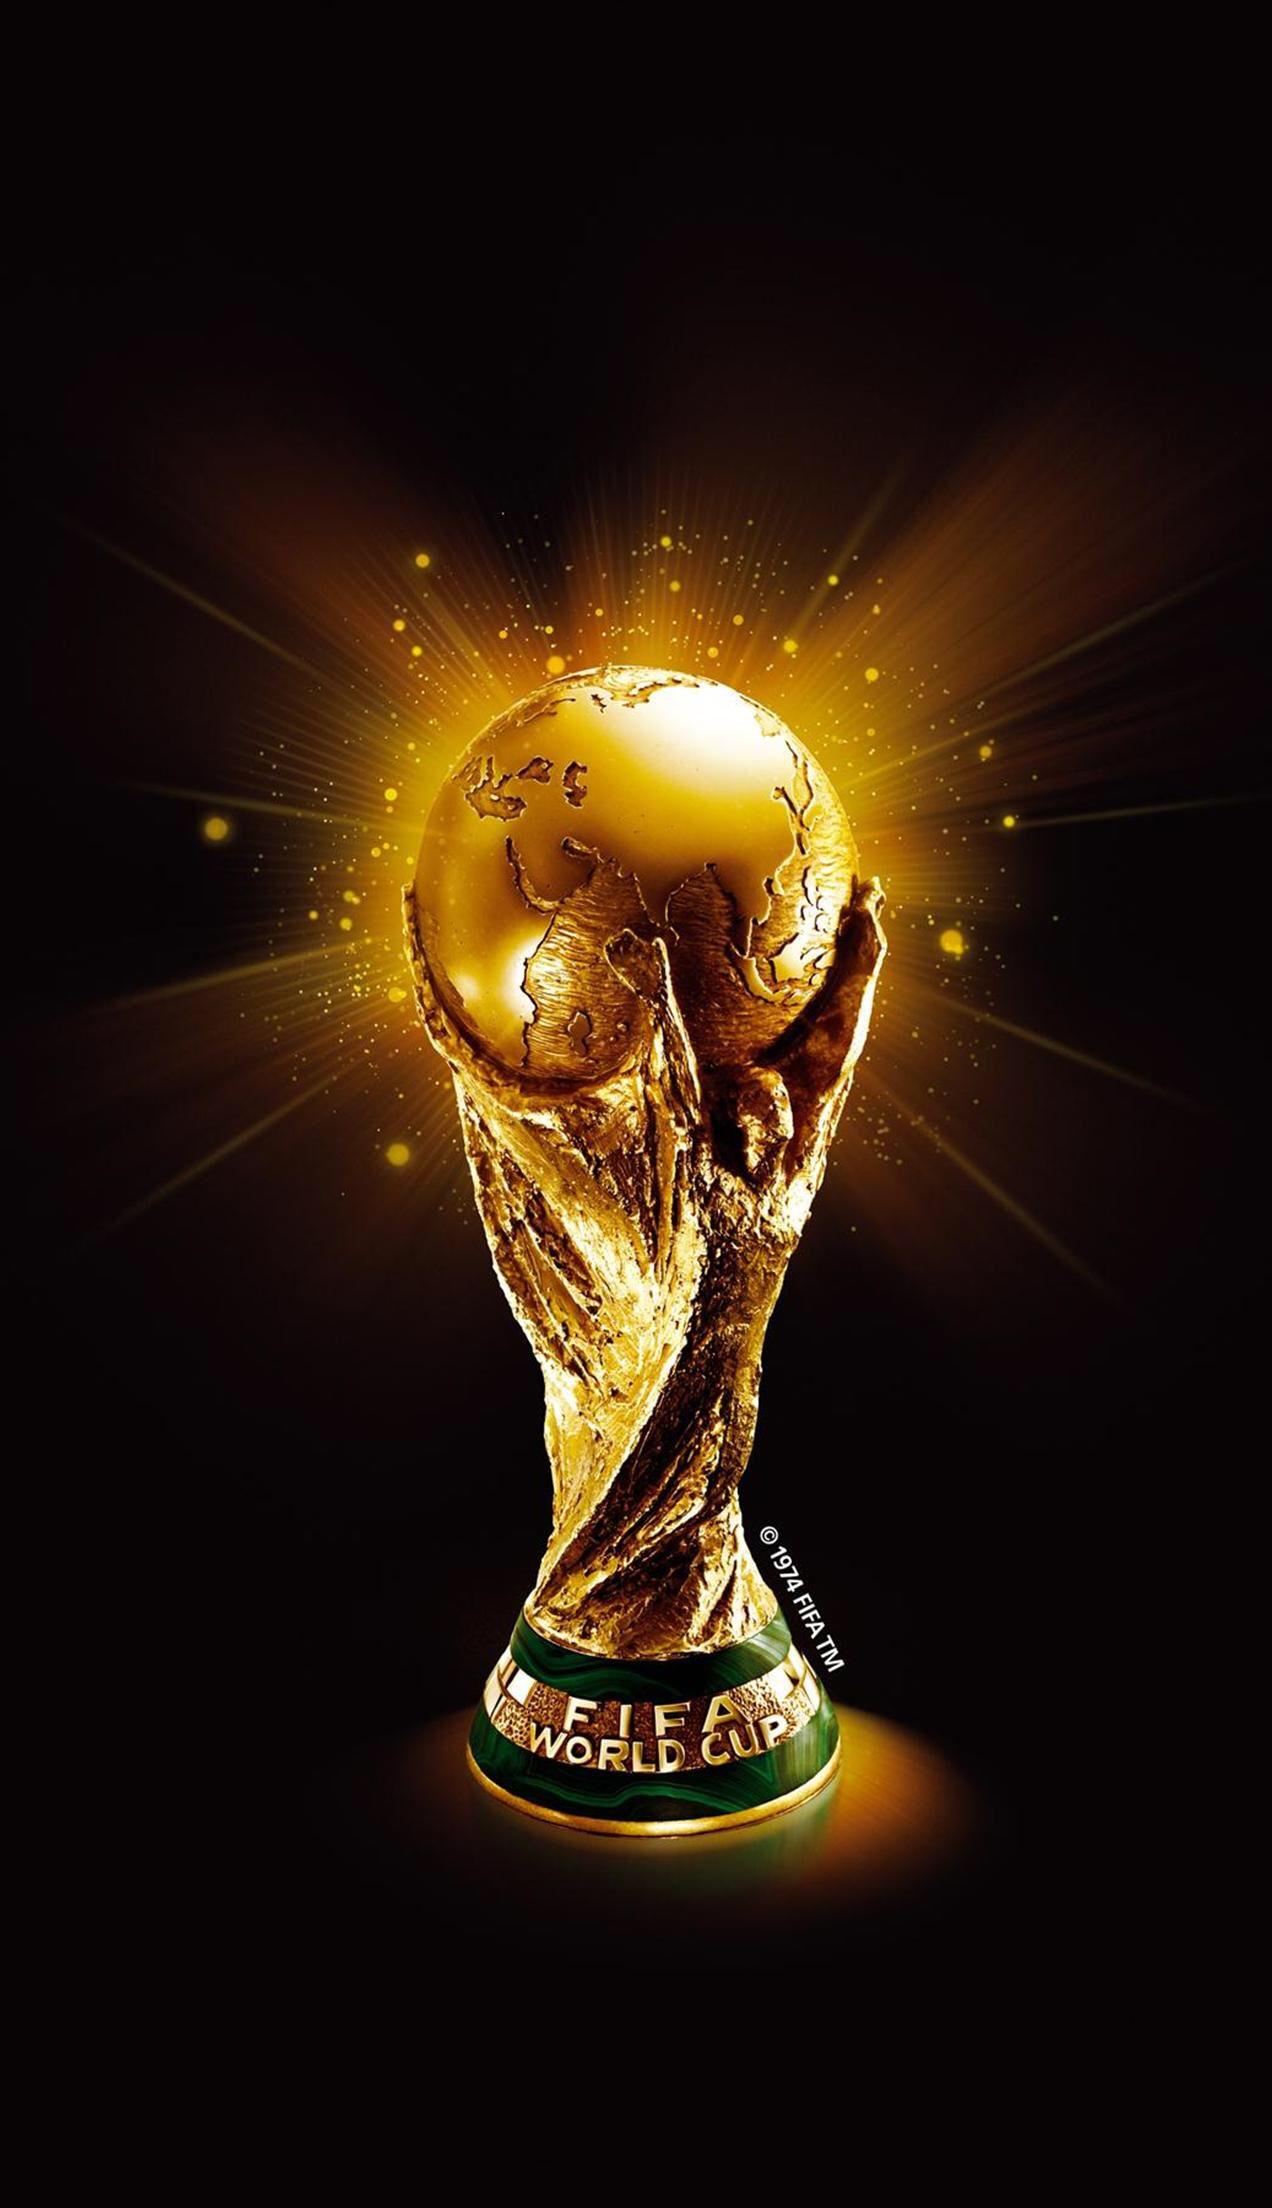 Http Stuckpix Com Wallpapershd I 7199 World Cup Trophy World Cup Fifa World Cup Fifa world cup wallpapers hd